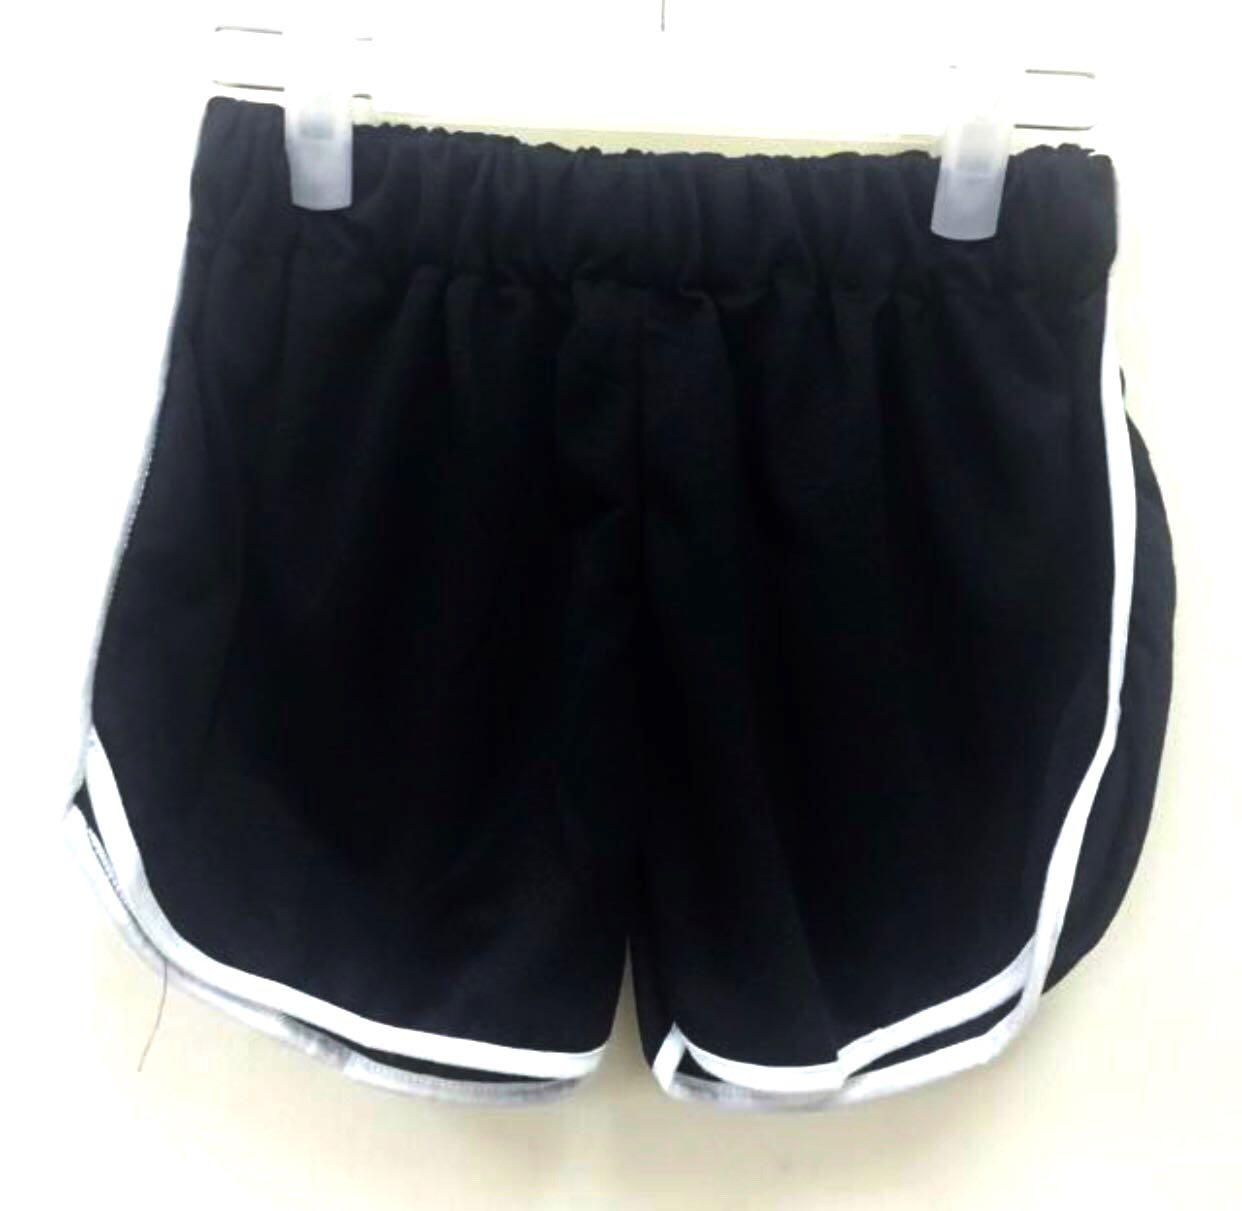 35a982e11a FIRE SALE   Black Trimmed Runner Shorts, Women's Fashion, Clothes ...